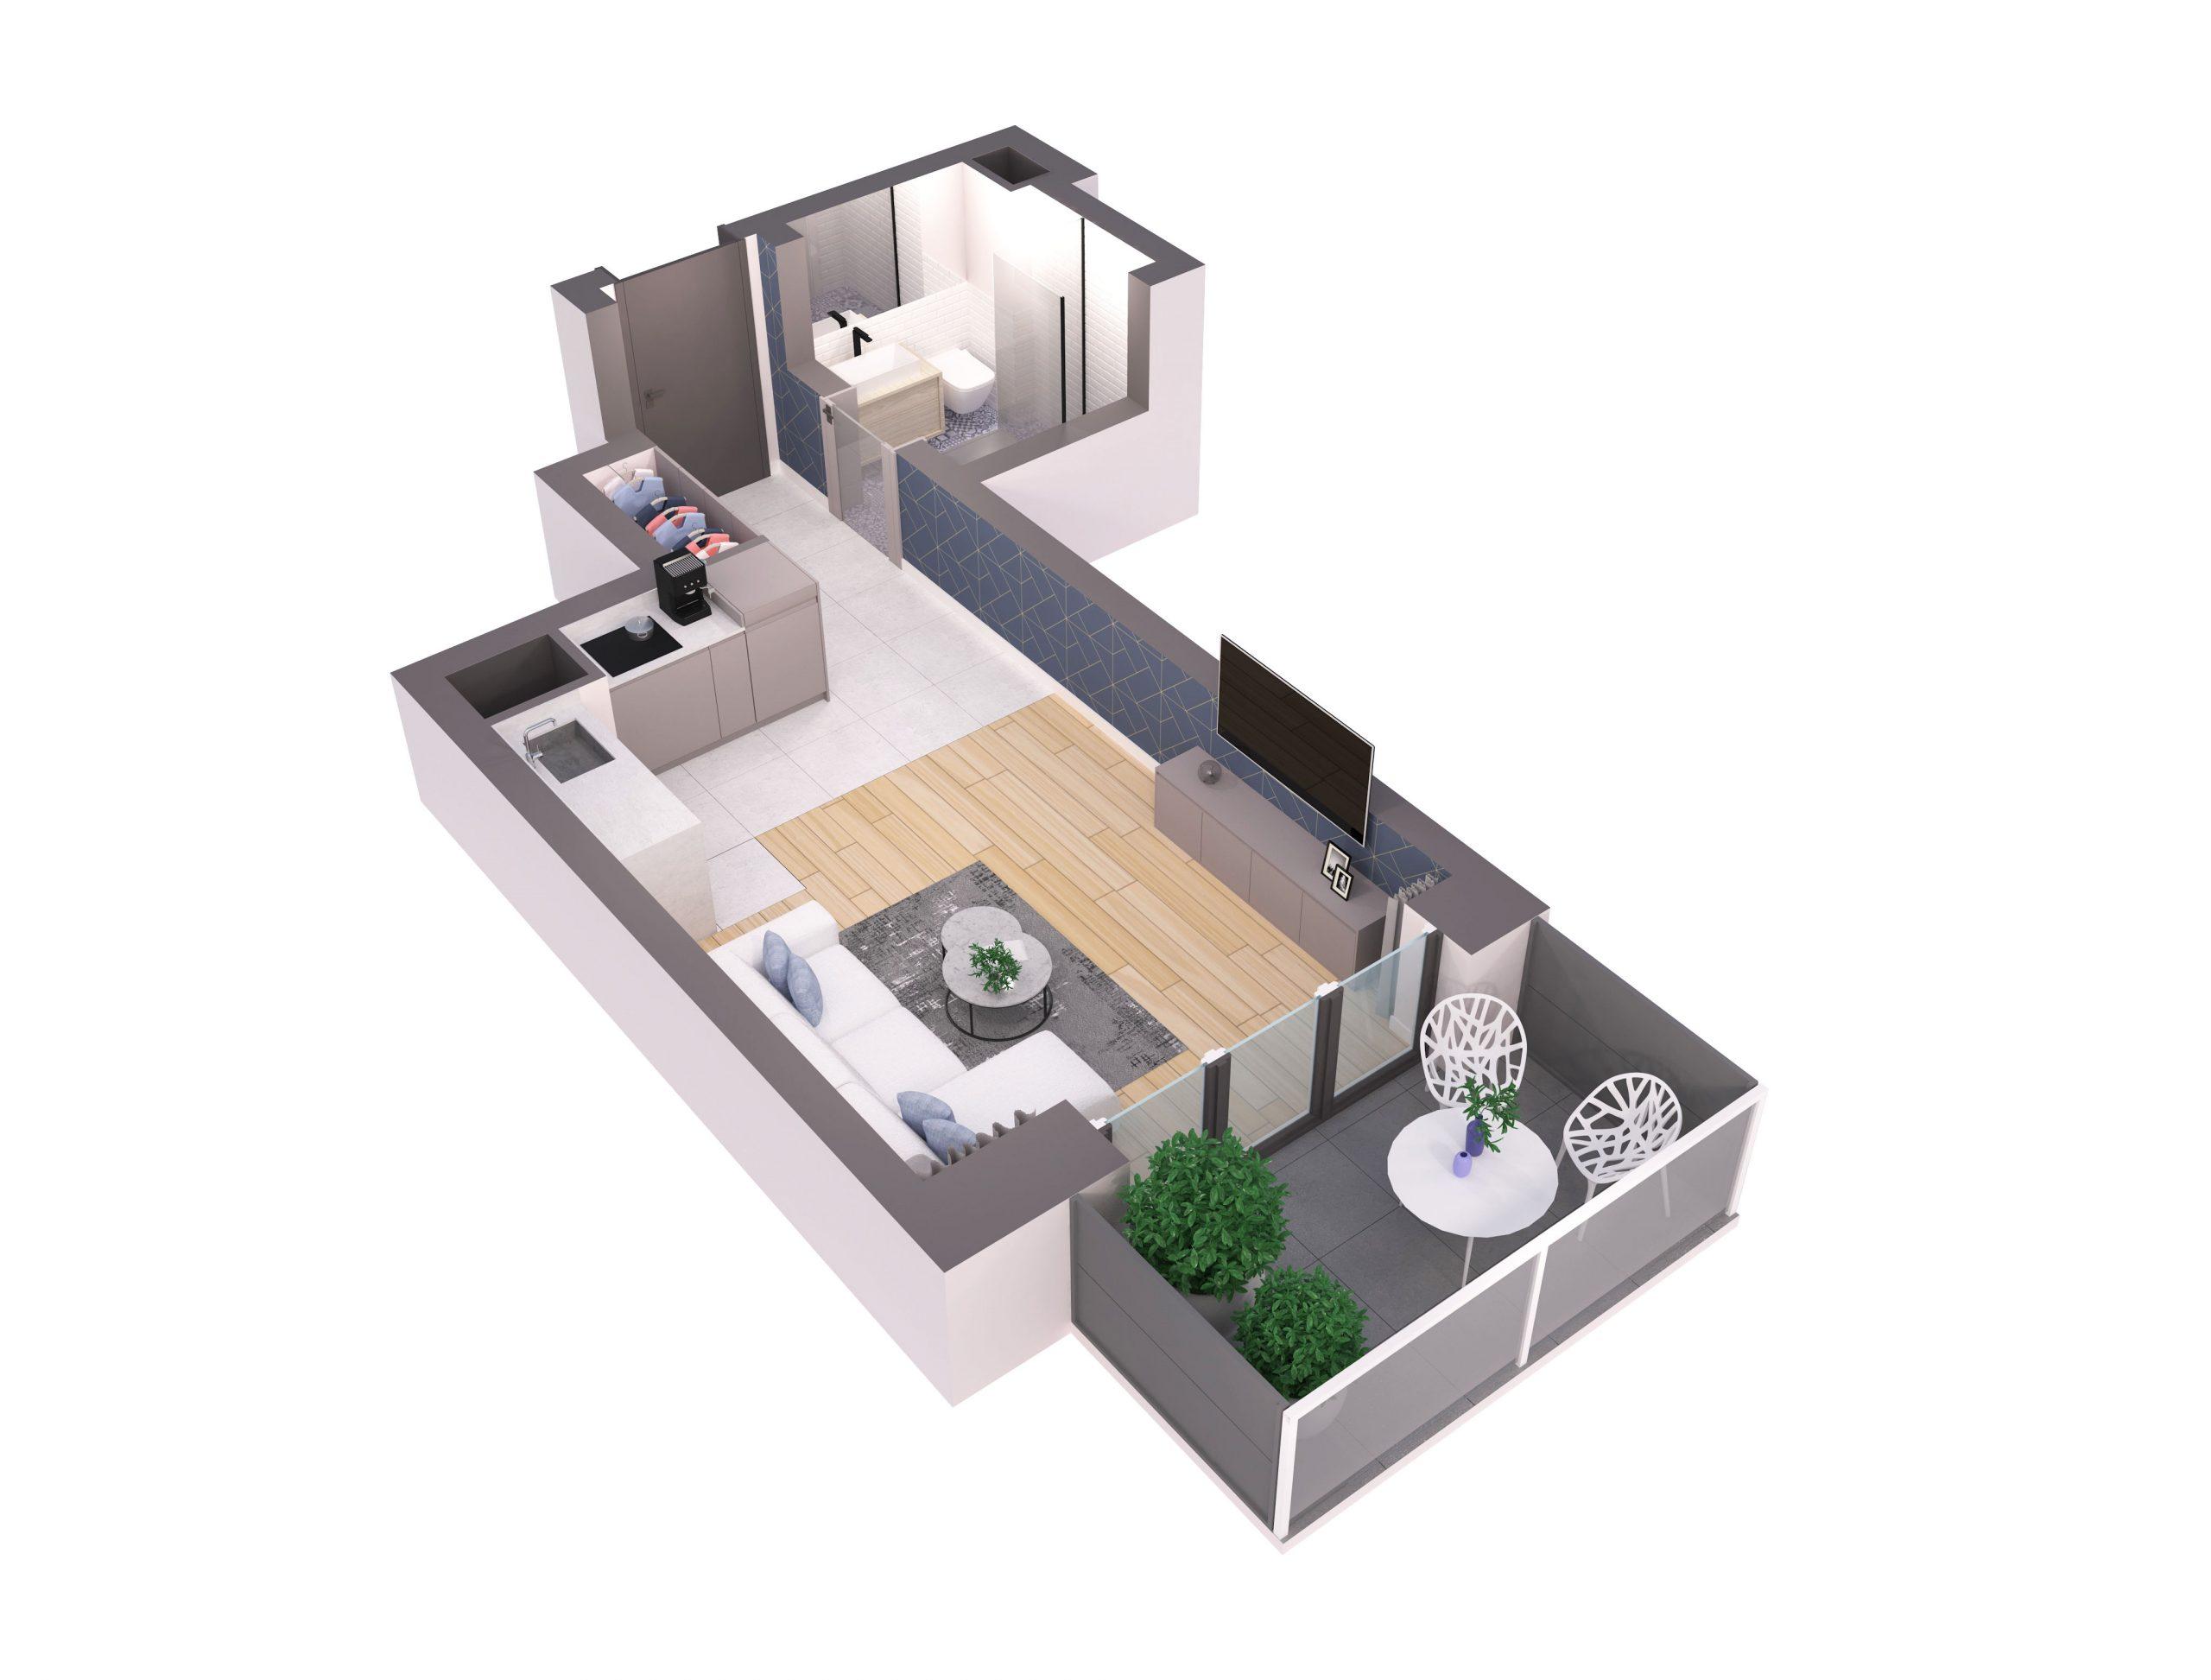 https://apartamentyjagiellonskie.pl/wp-content/uploads/2021/08/B217-scaled.jpg